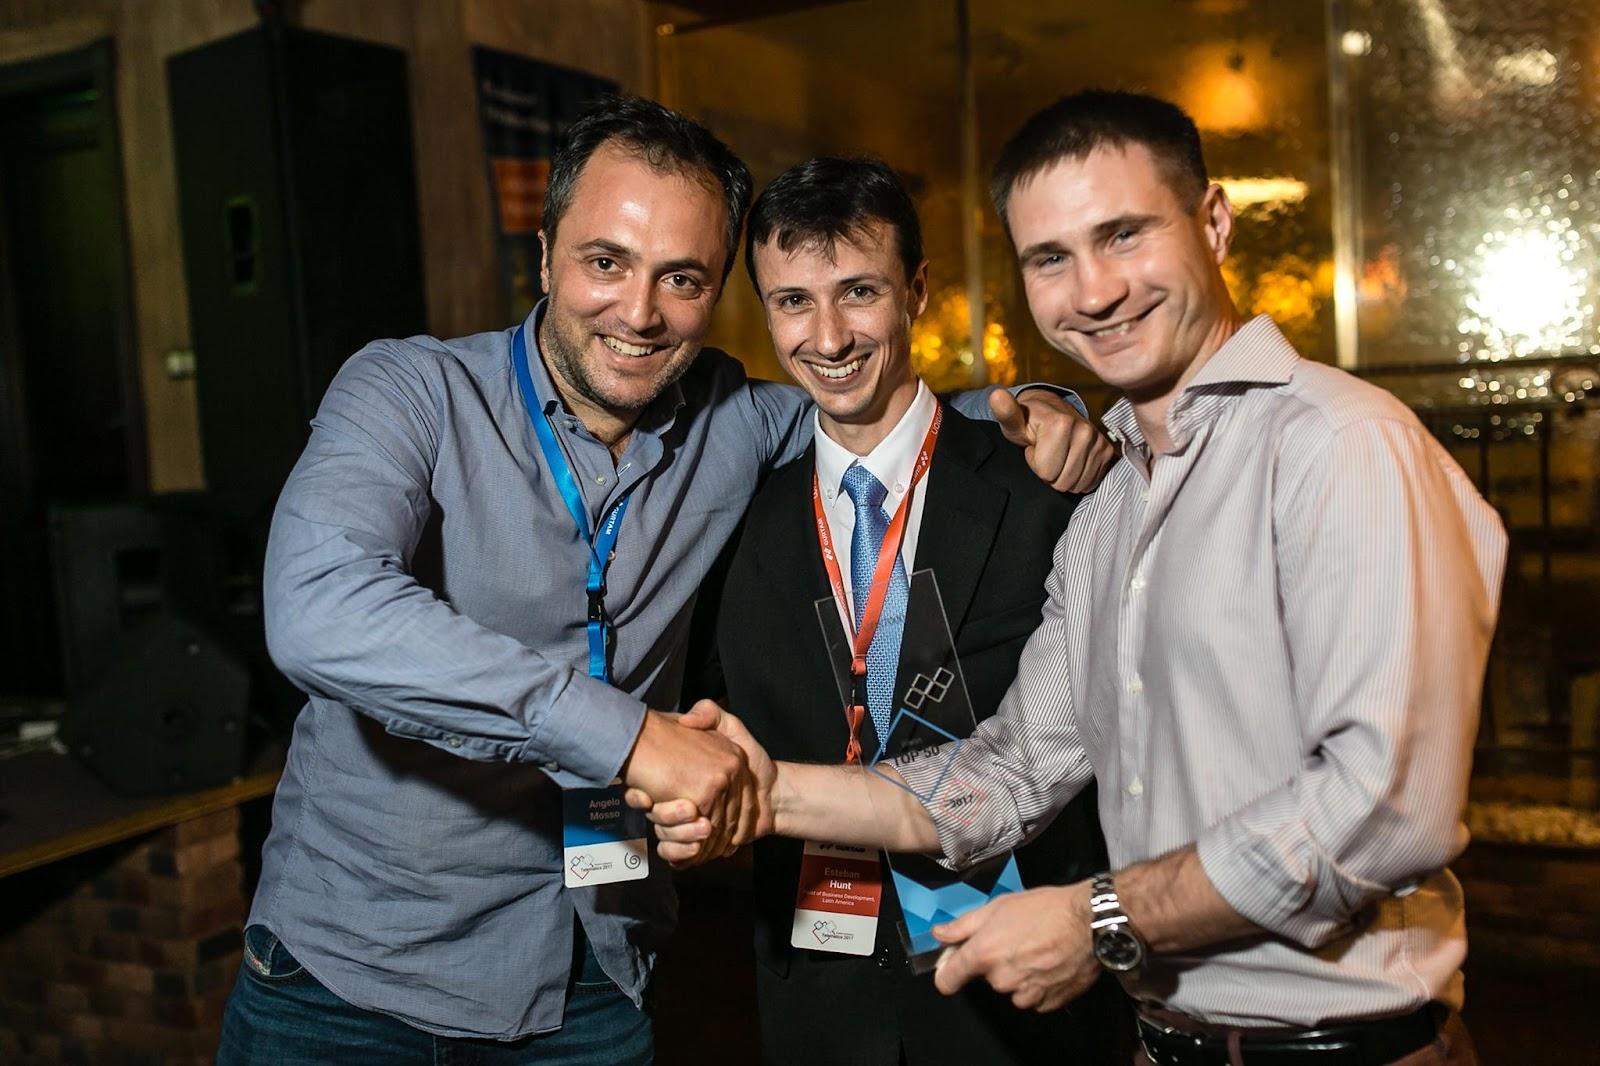 Анджело Моссо, CEO GPS7000, с Эстебаном Хантом и Алексеем Щурко